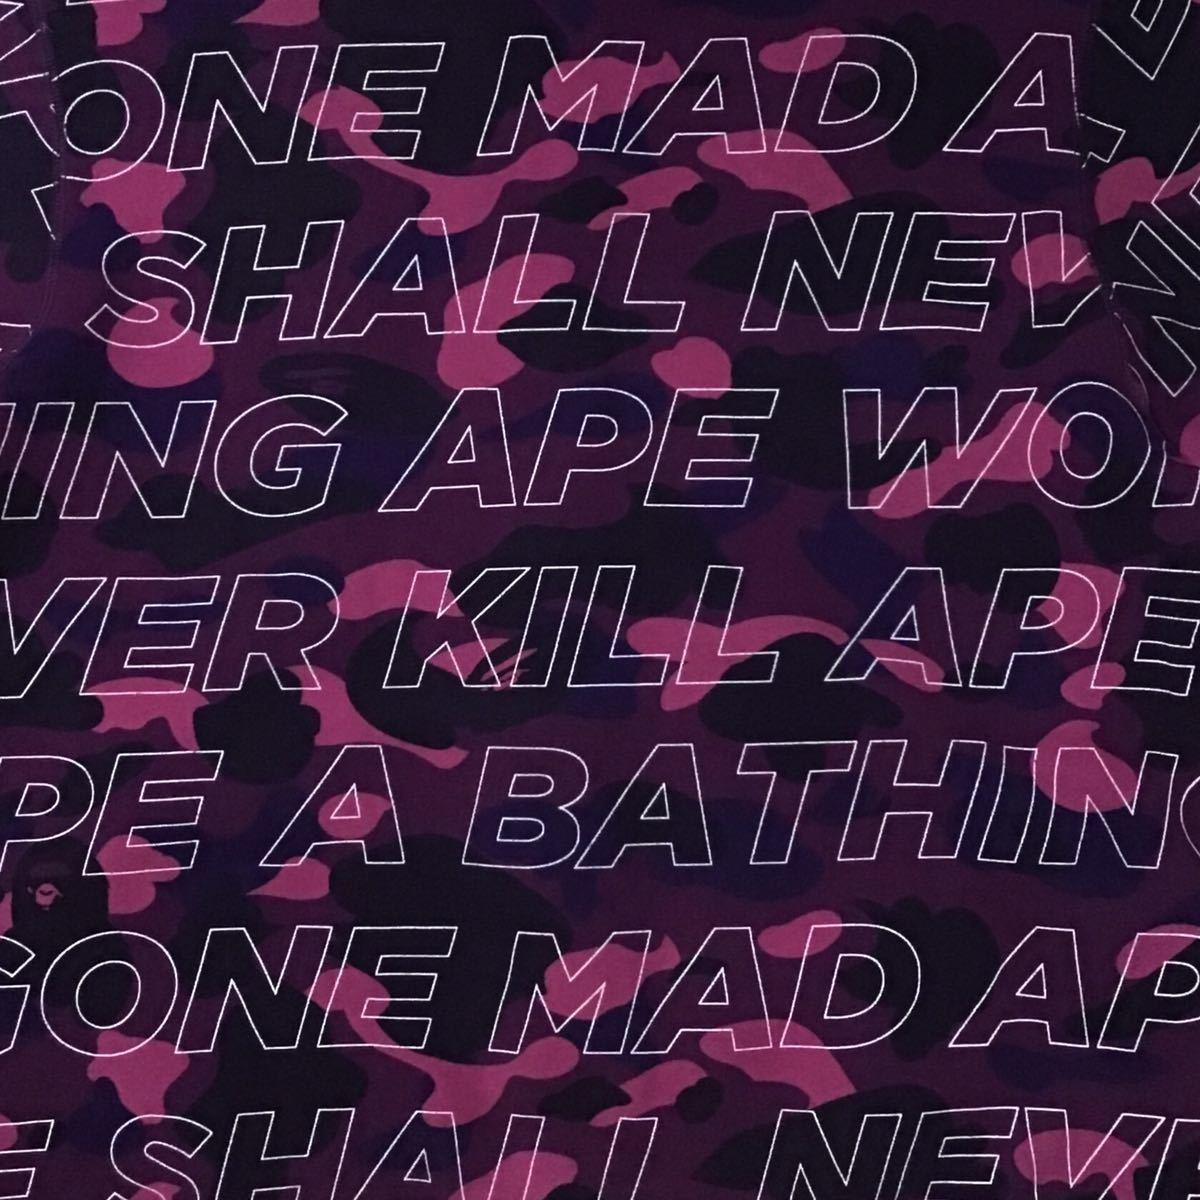 Text color camo シャーク パーカー Mサイズ shark full zip hoodie a bathing ape bape エイプ ベイプ アベイシングエイプ purple camo h9